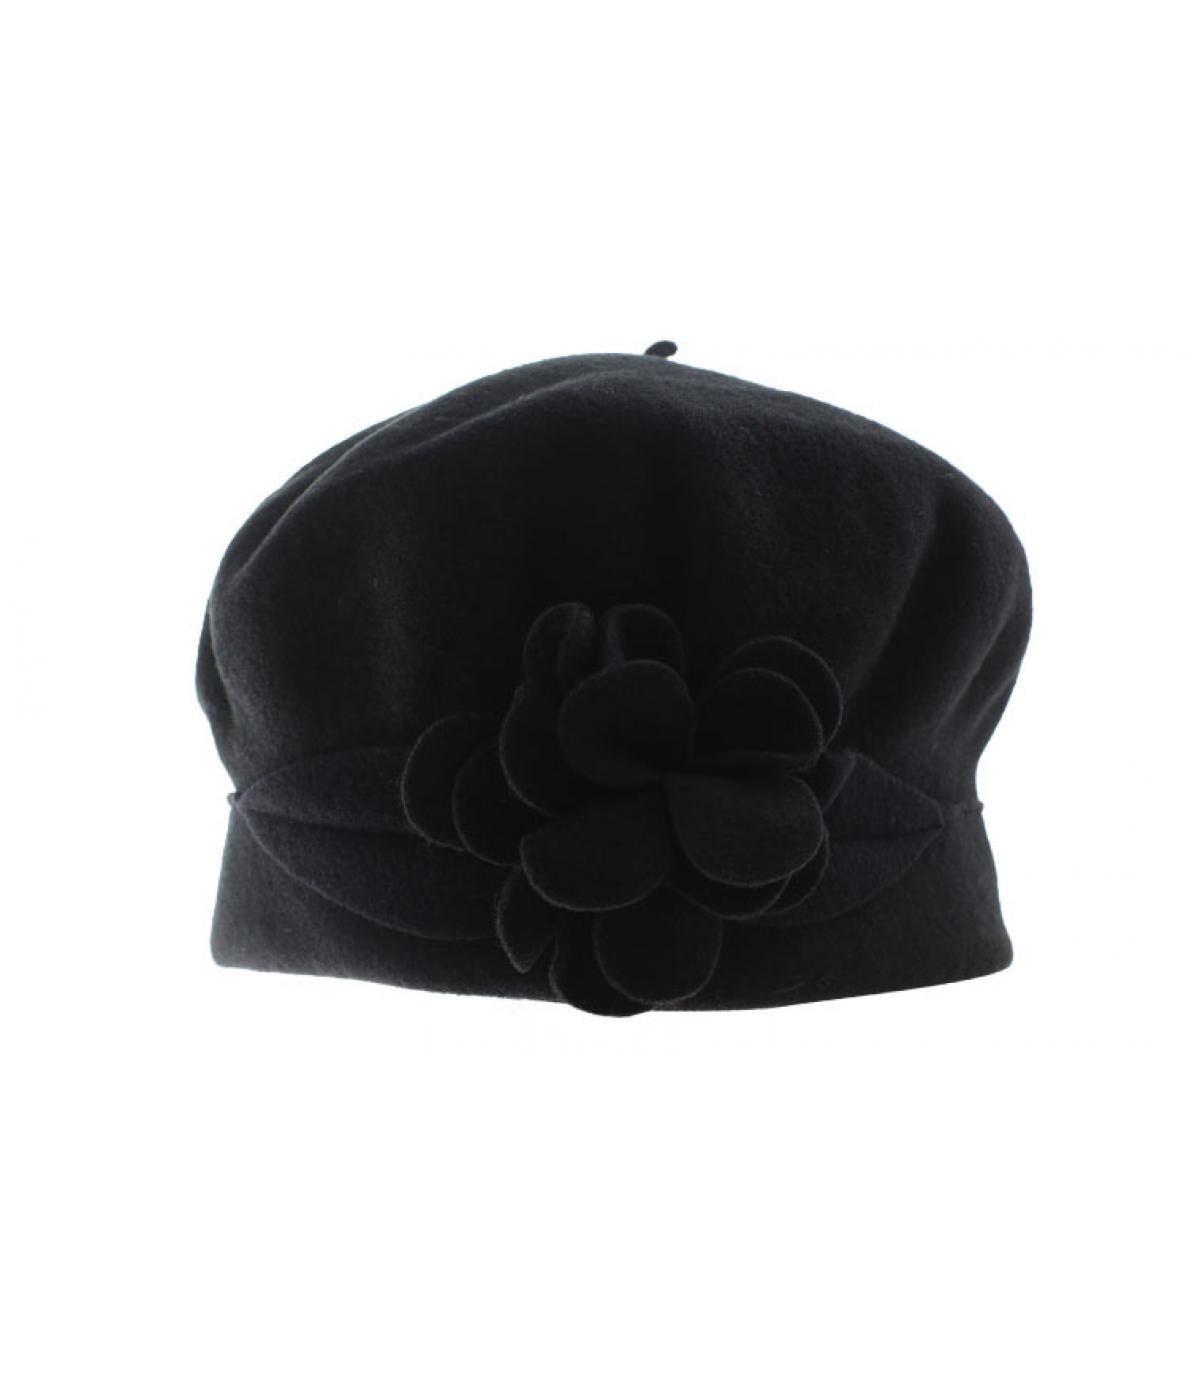 Details Capucine noir - Abbildung 2